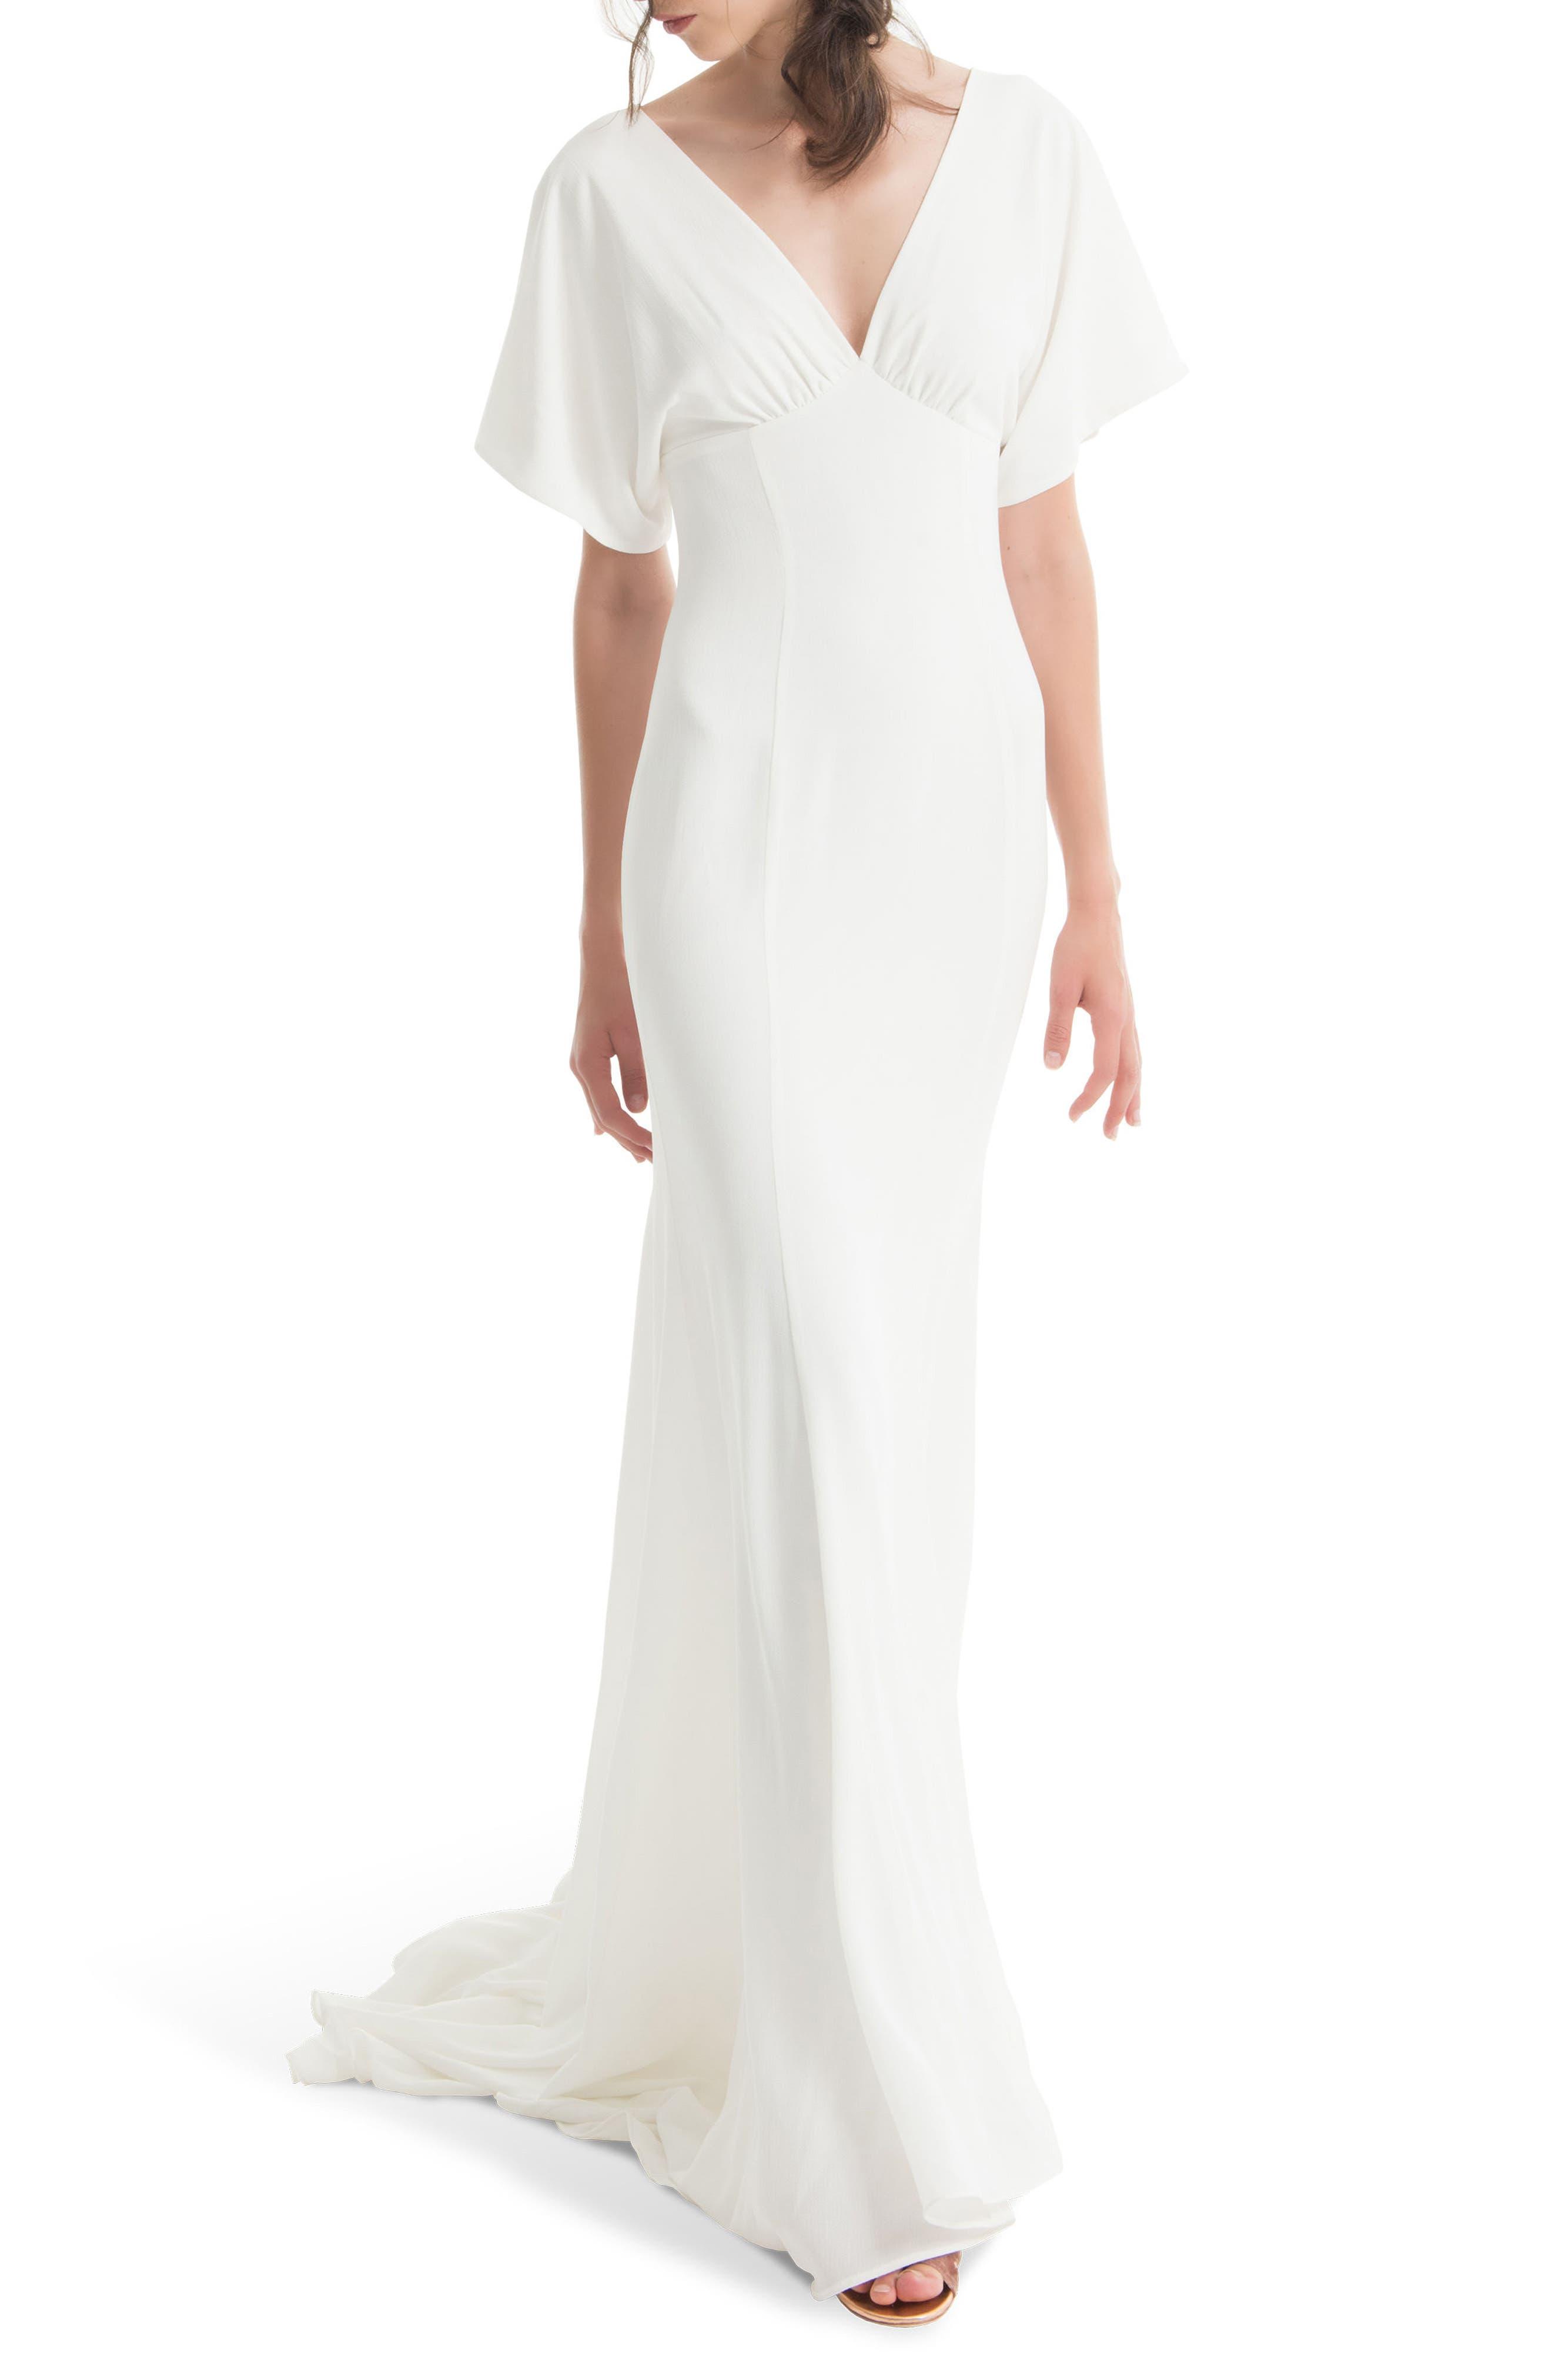 JOANNA AUGUST Pattie Empire Waist Crepe Gown, Main, color, WHITE